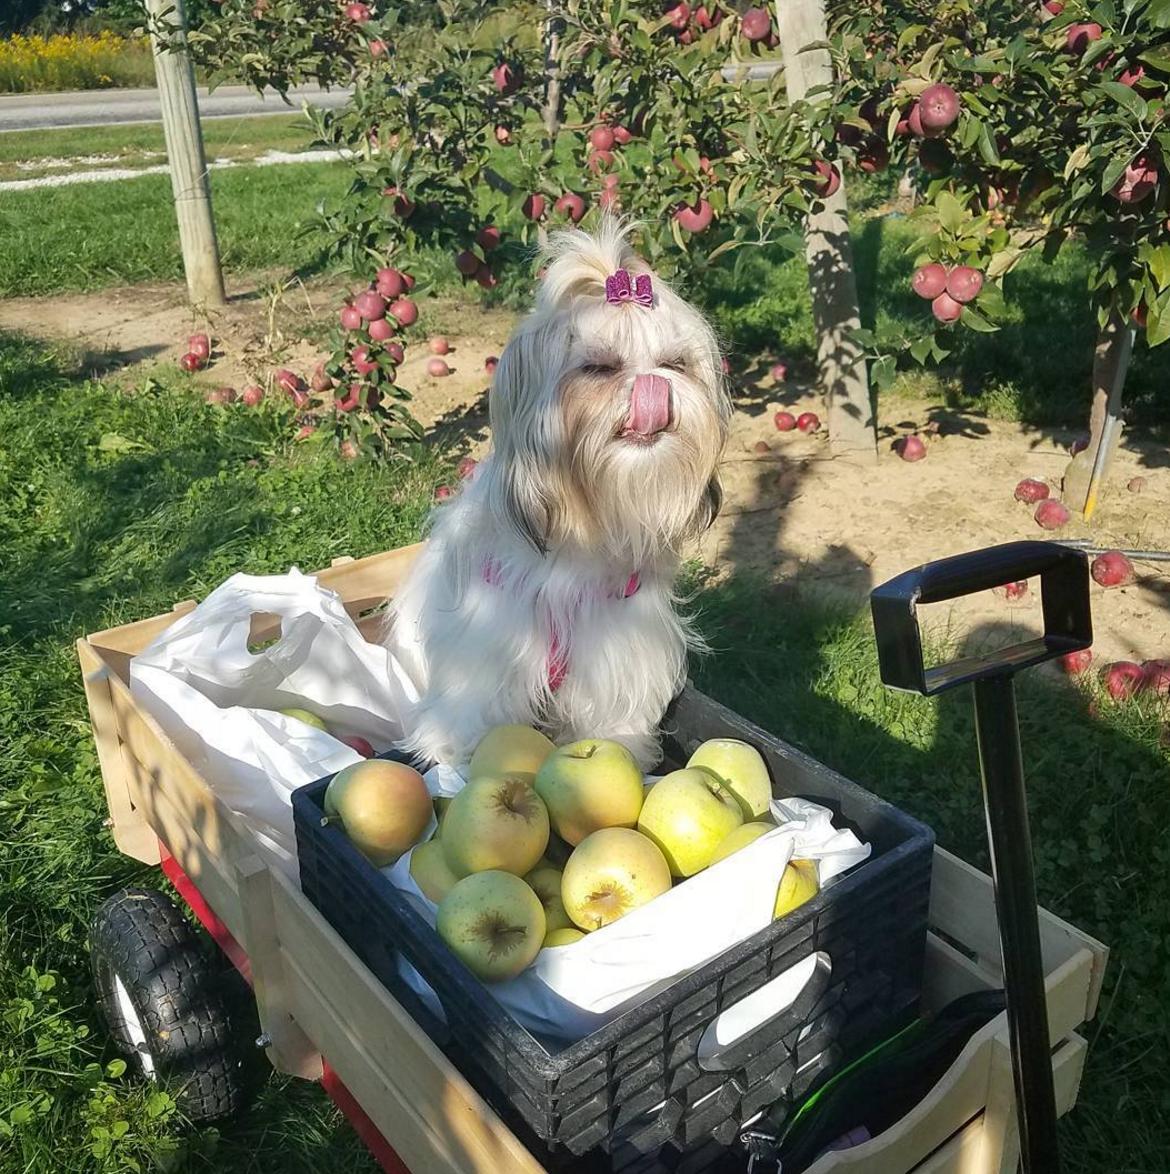 Photo by @iggyshihtzalea at Bauman Orchards in Rittman, Ohio